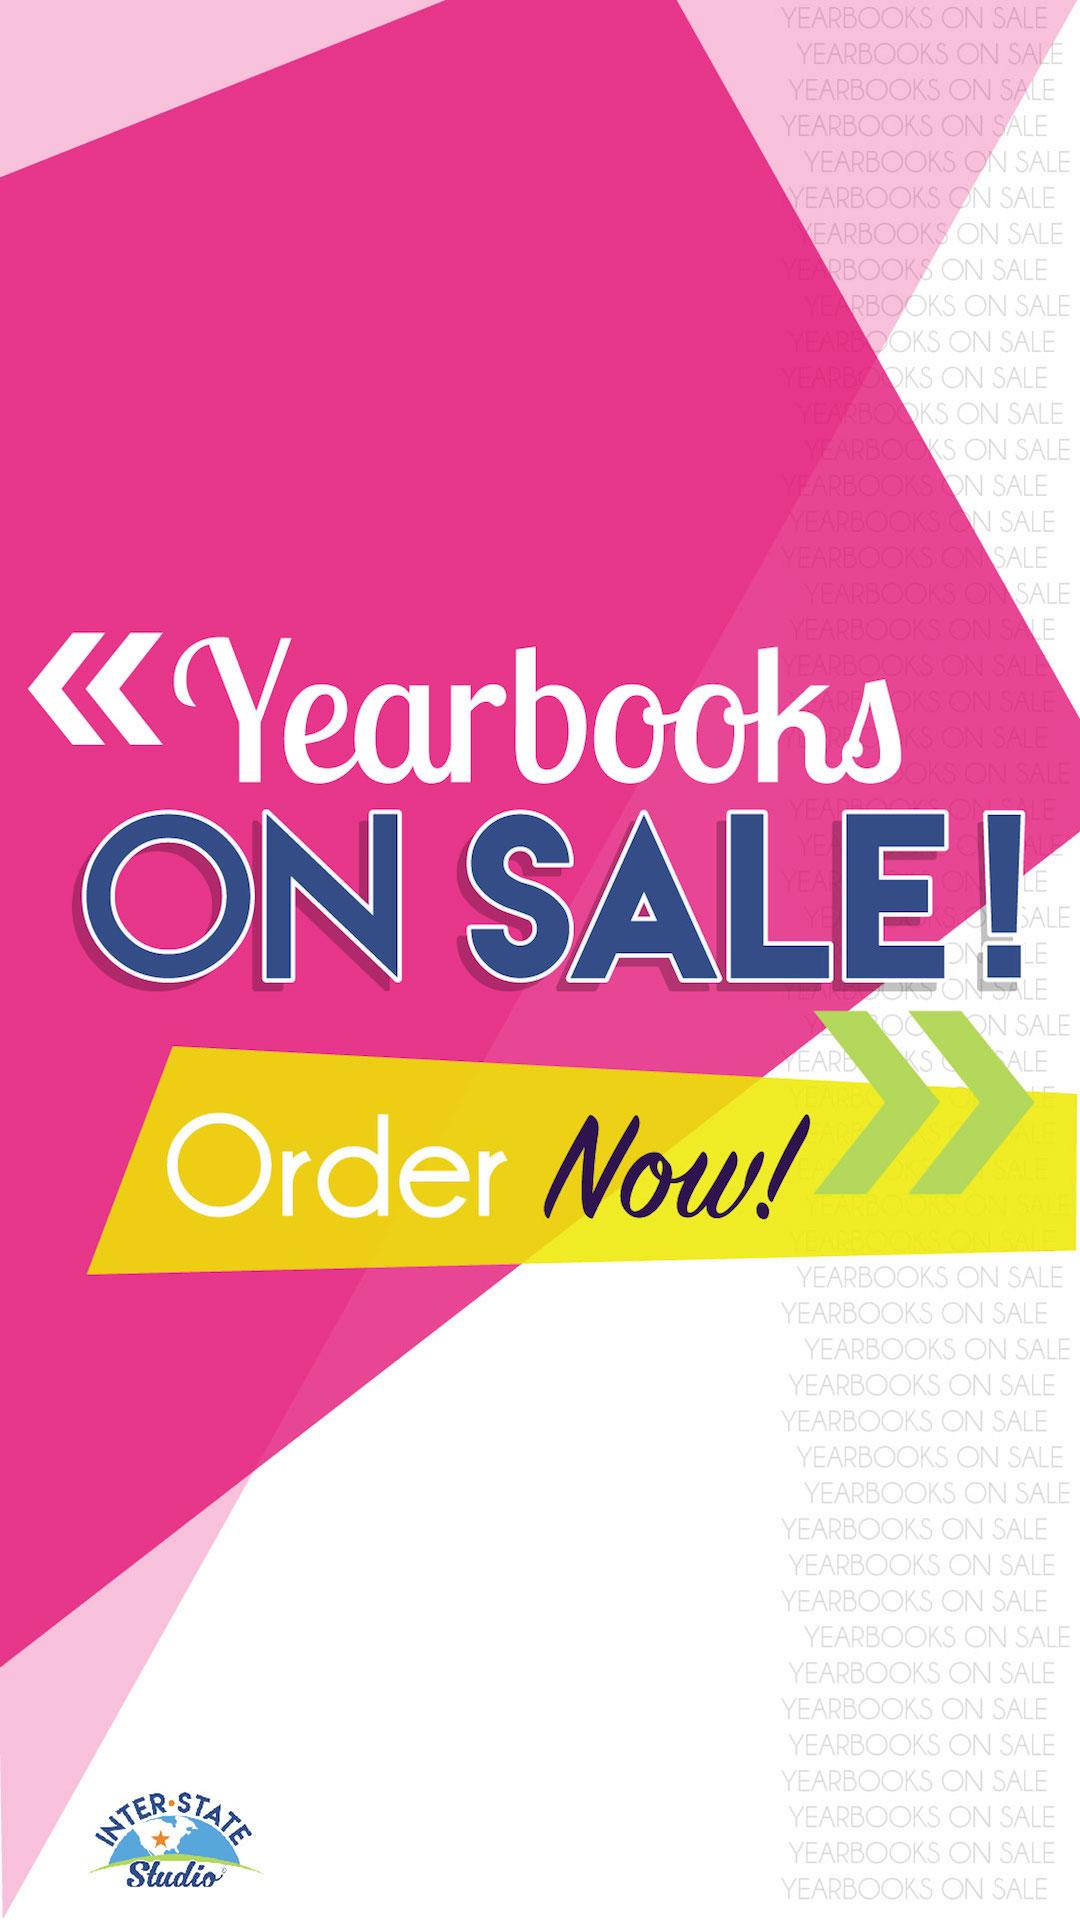 Yearbook Toolbox